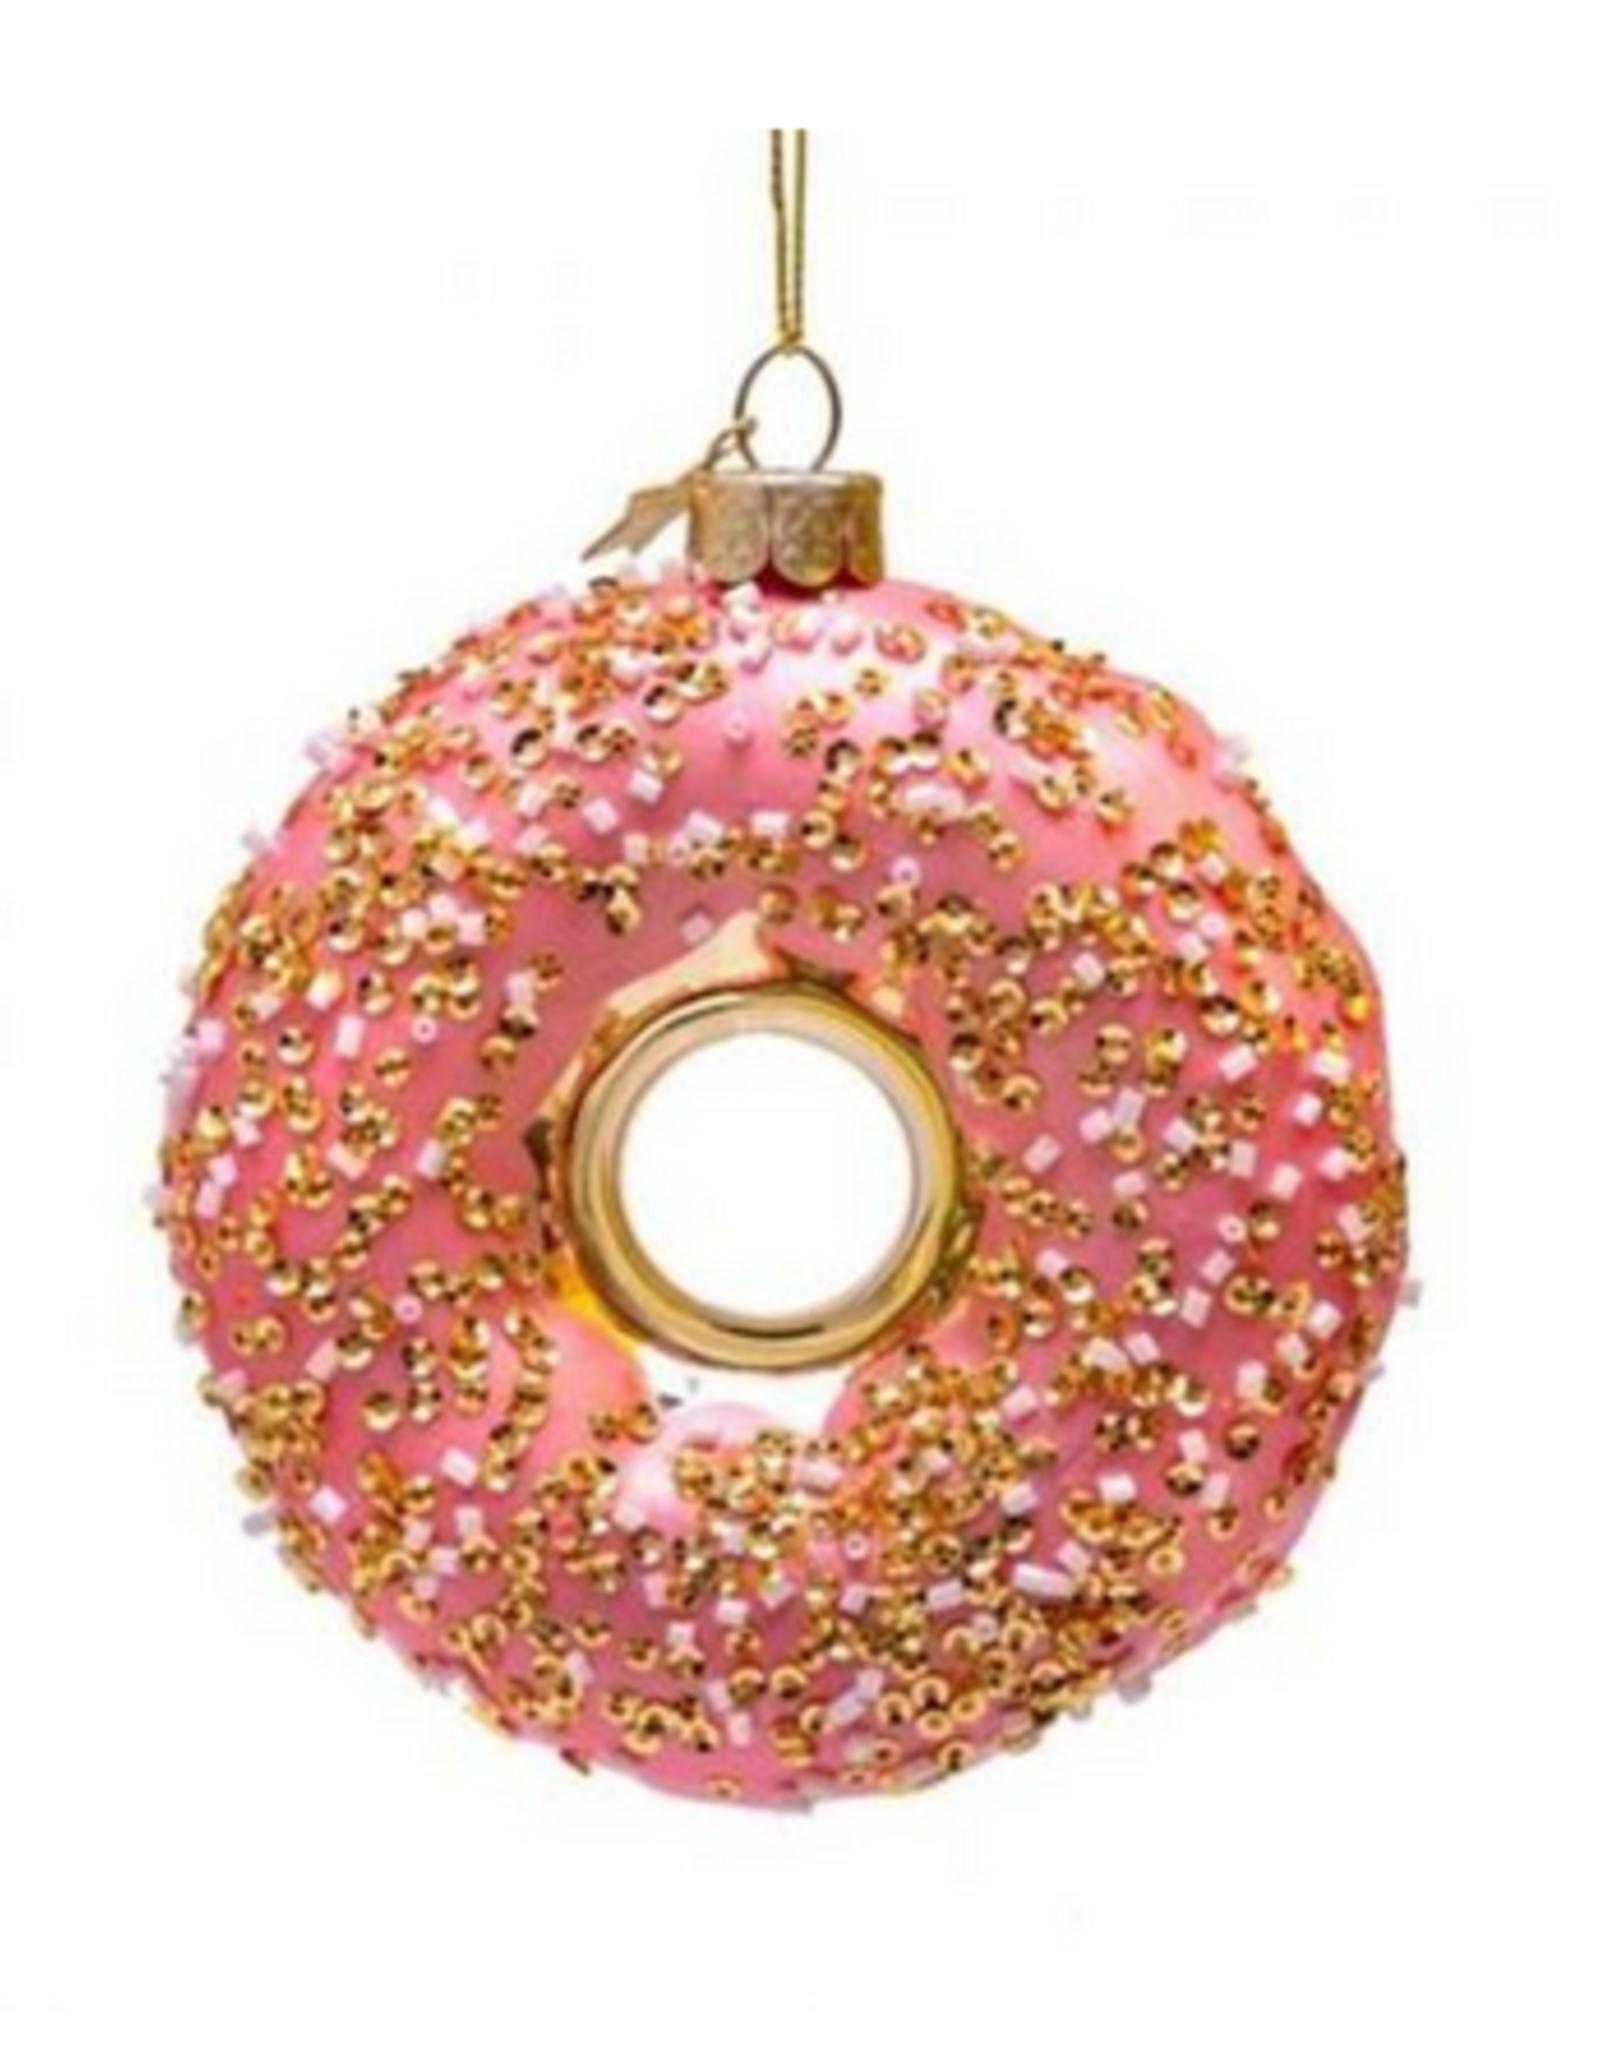 Vondels Pink donut christmas ornament